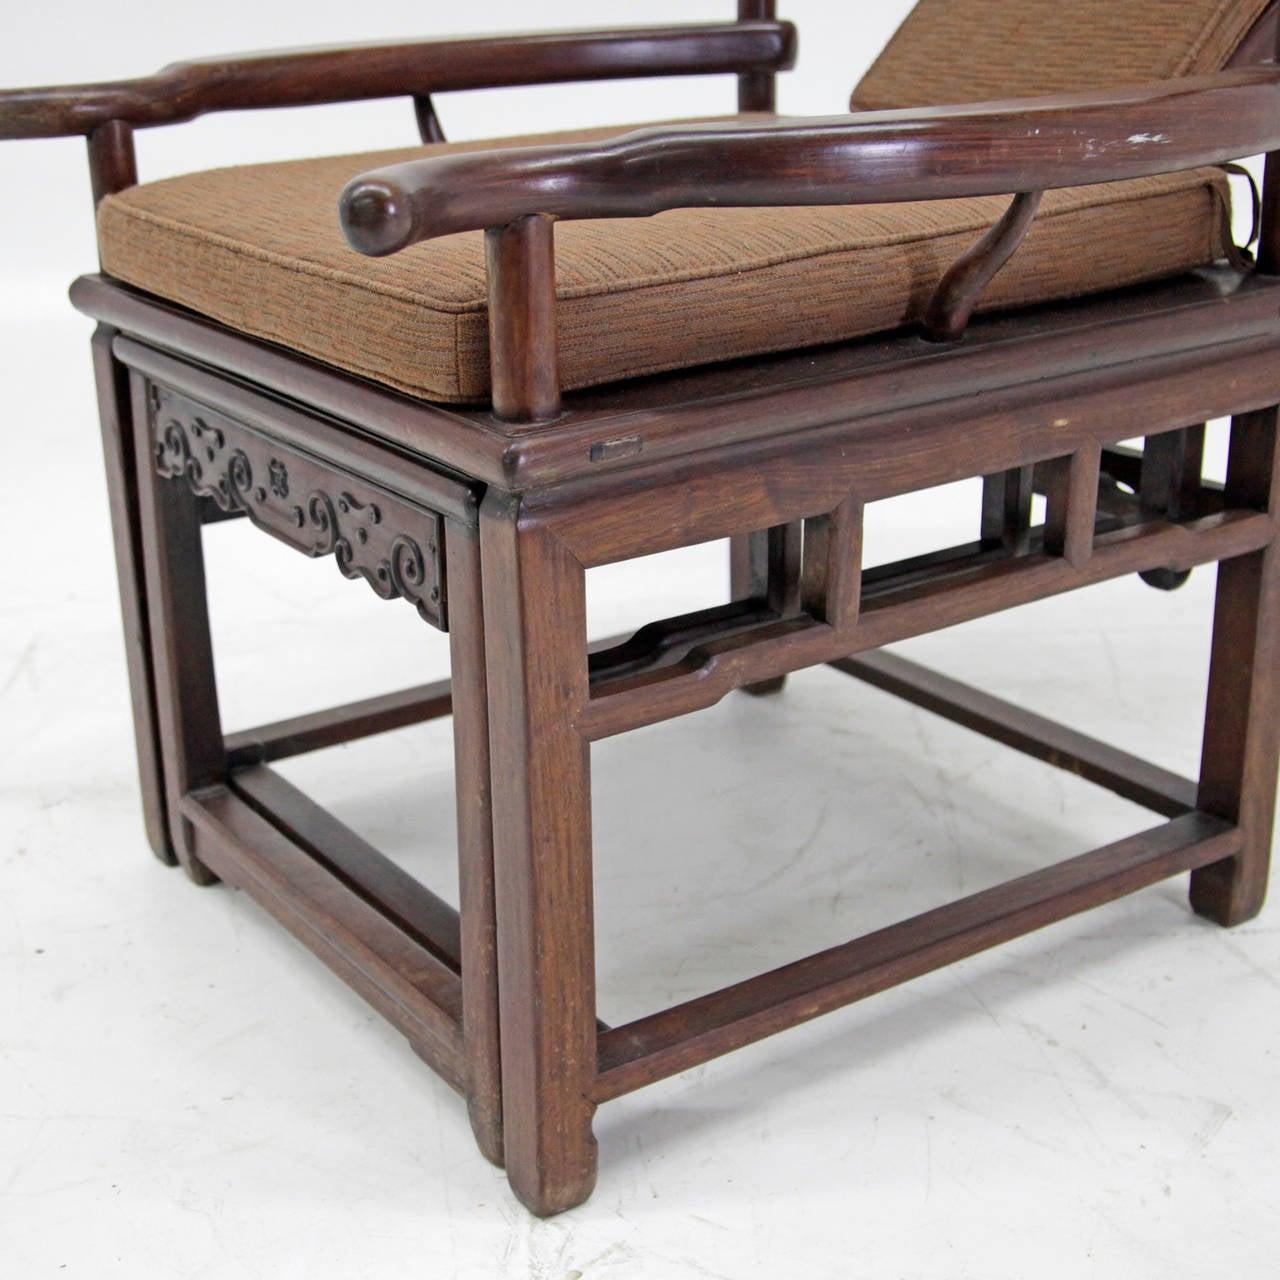 Remarkable Exceptional Asian Recliner Or Deck Chair Circa 1900 1910 Creativecarmelina Interior Chair Design Creativecarmelinacom